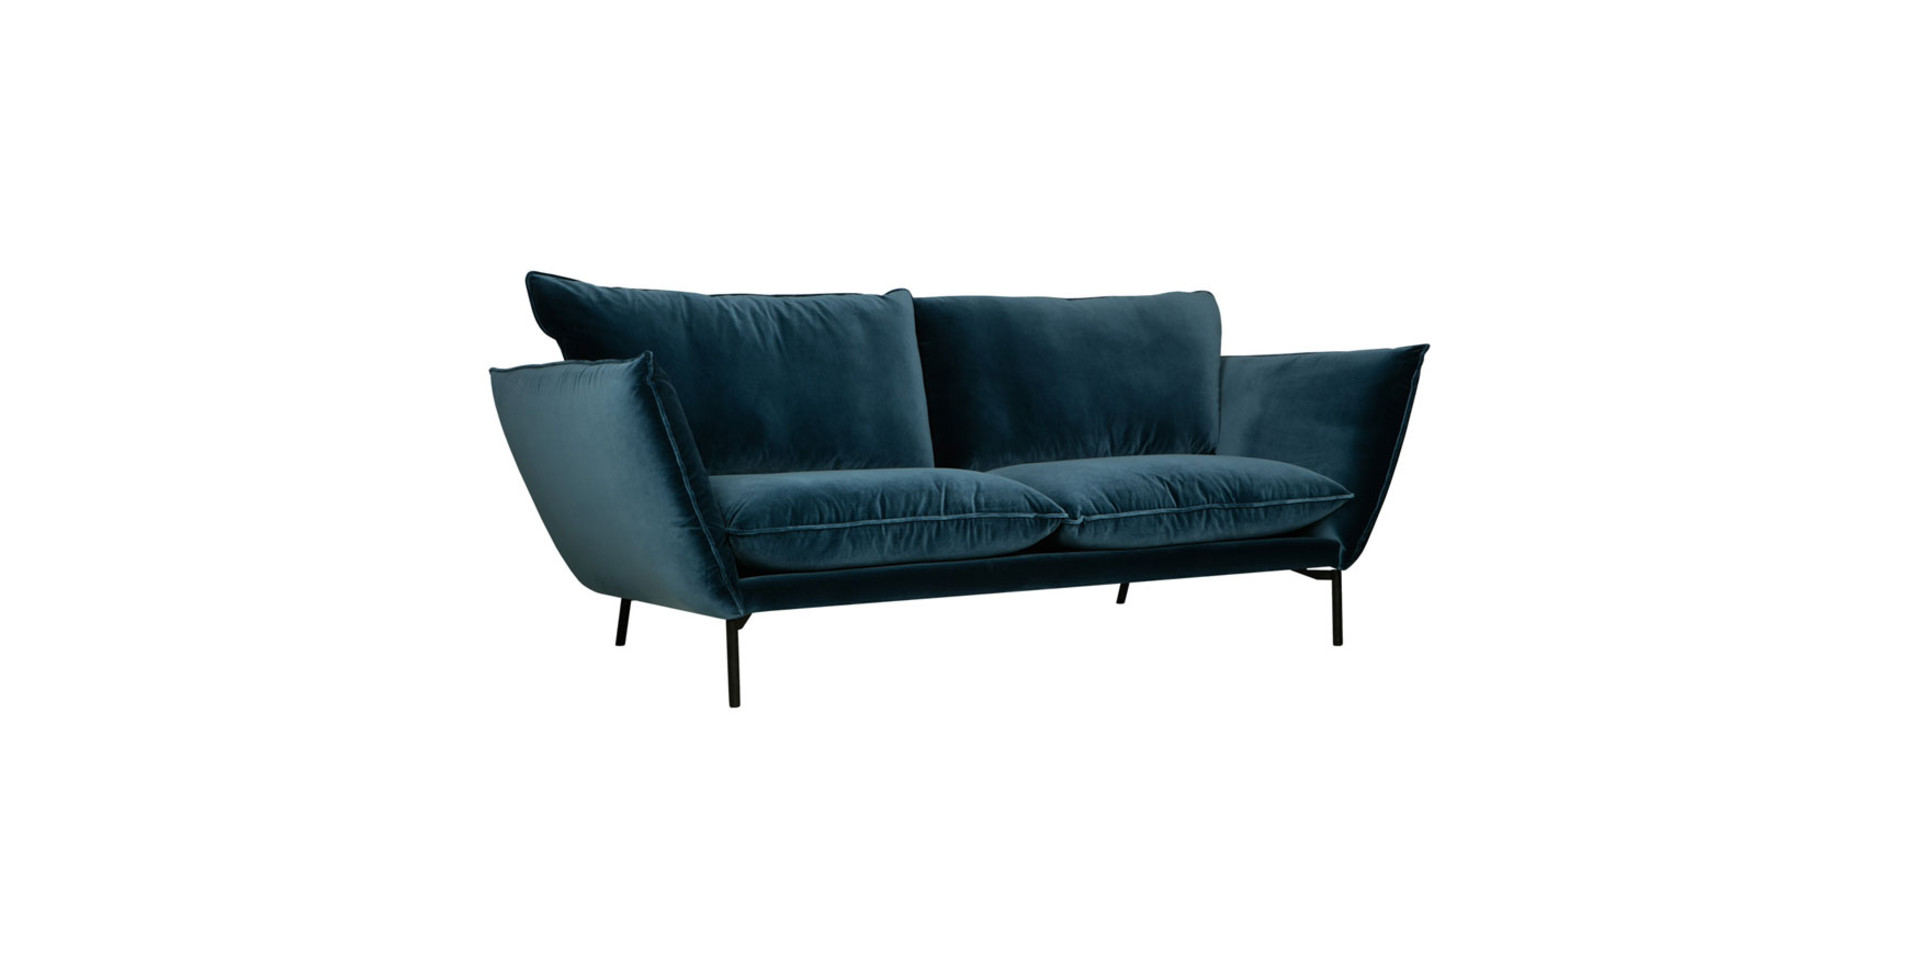 sits-hugo-canape-3seater_lario58_blue_2